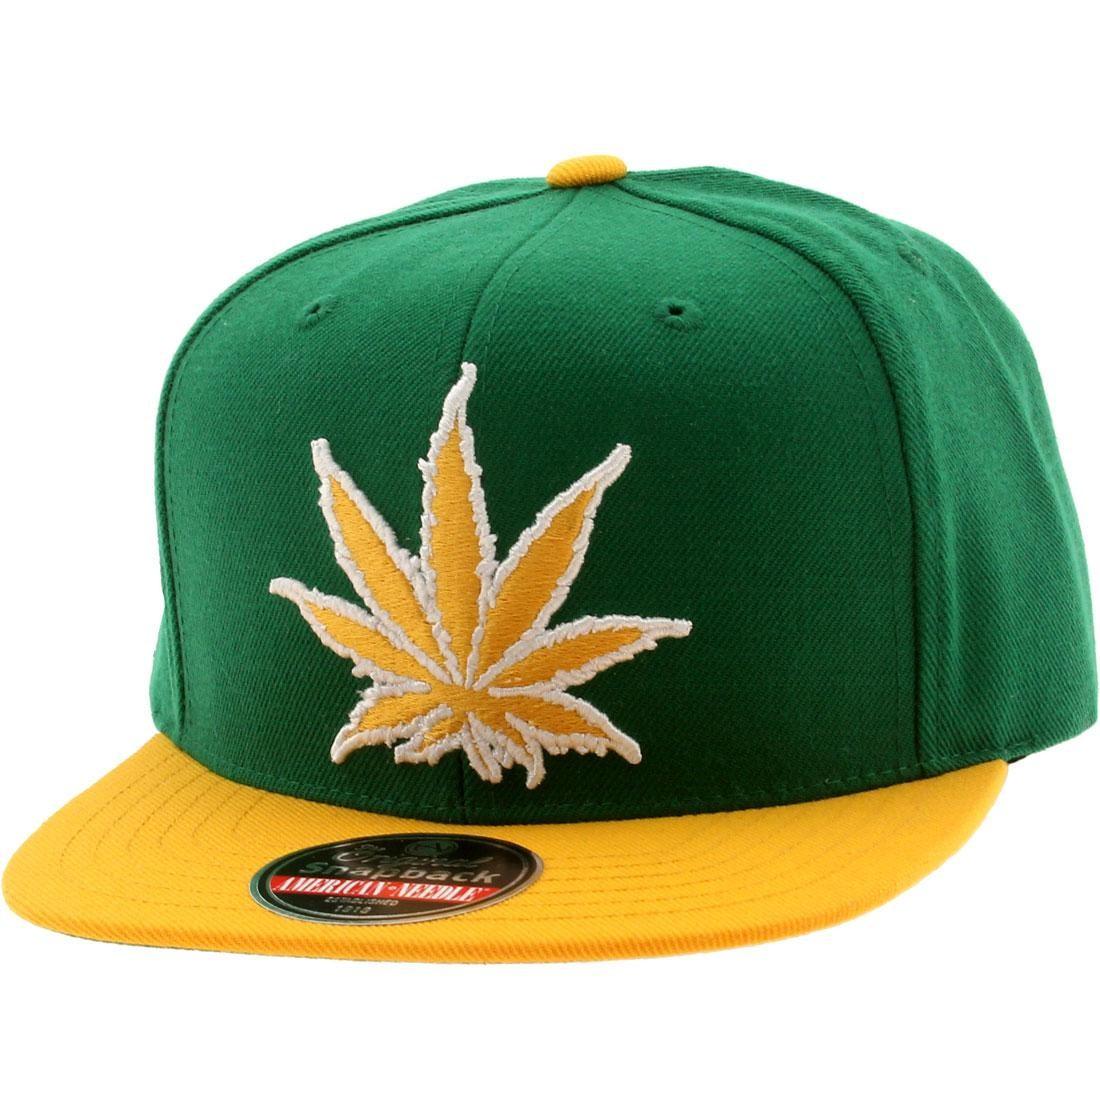 American Needle Experience Washington Legalized Cap (green / gold)